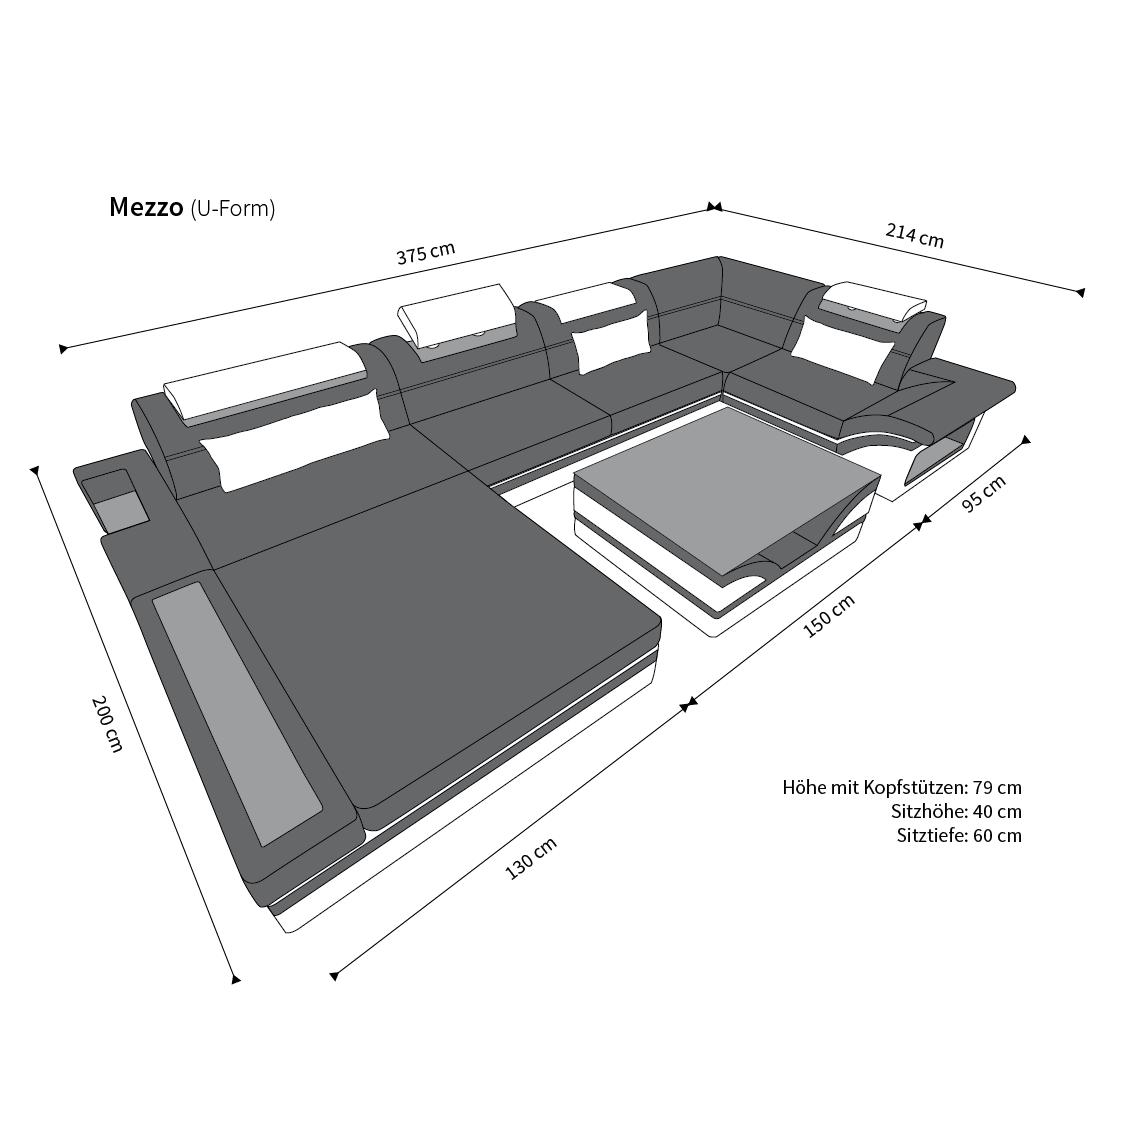 LEDER Wohnlandschaft MEZZO LED Echtleder Luxussofa DESIGN SOFA + + + ...